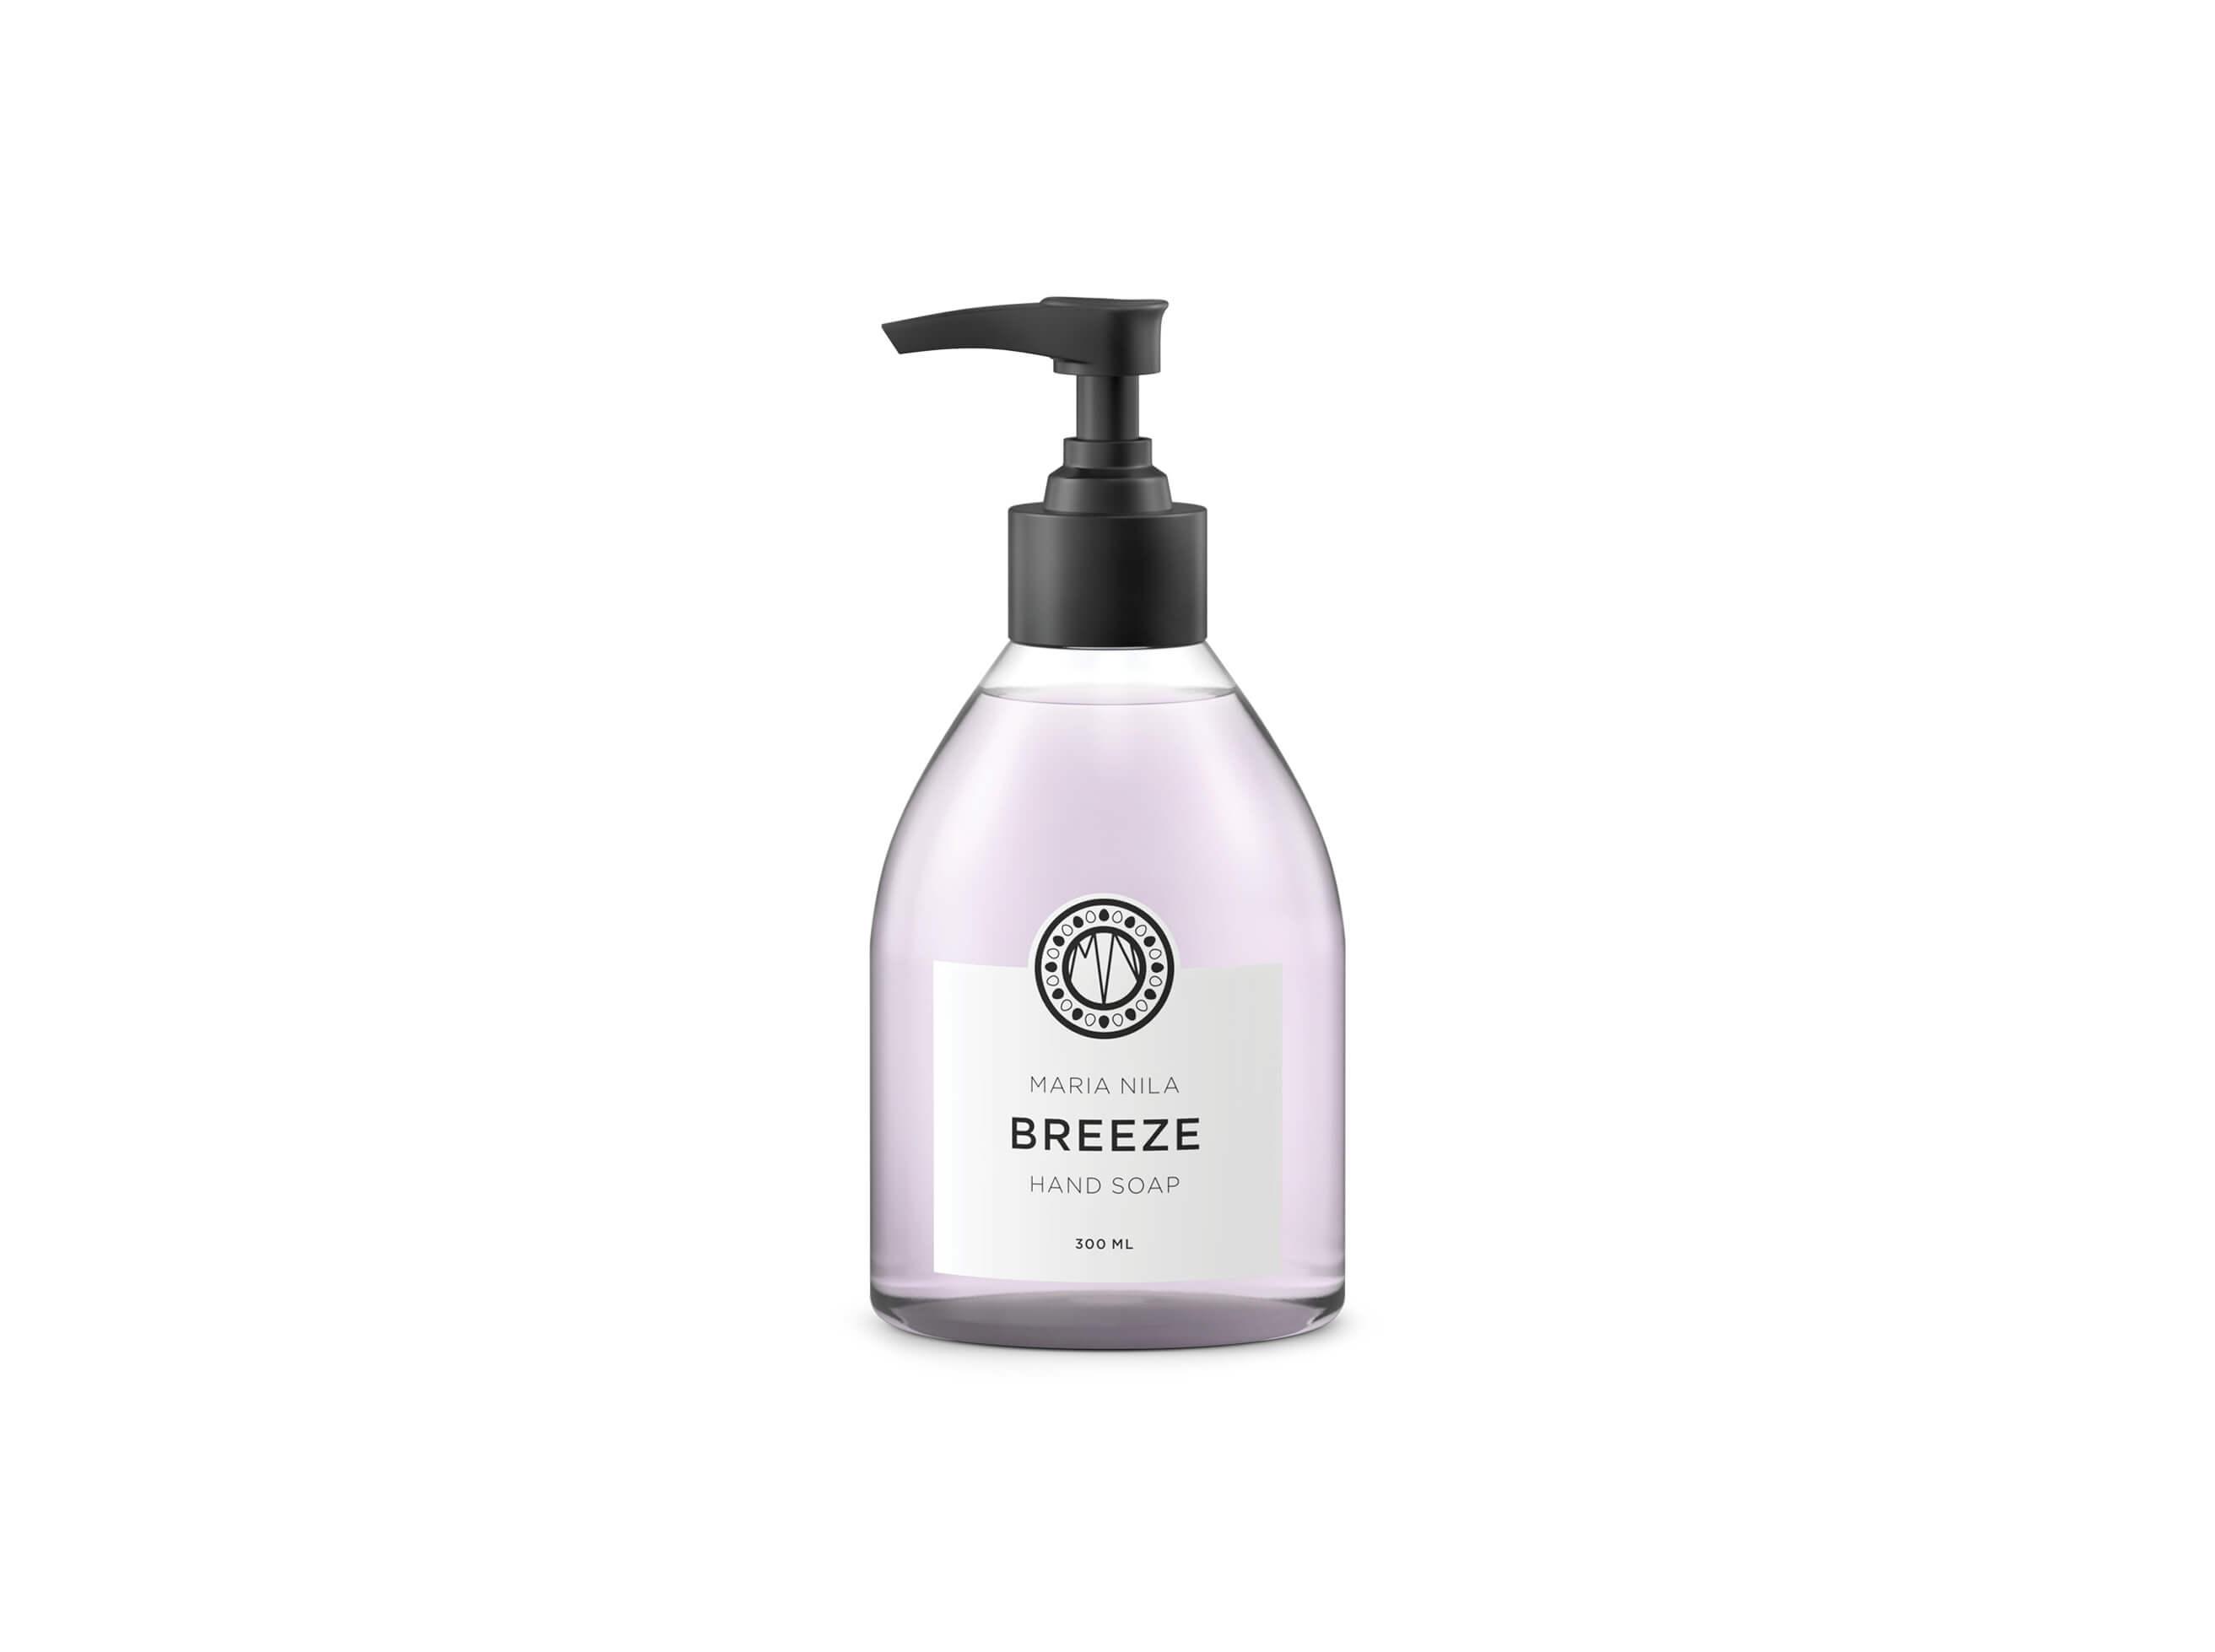 Breeze Hand Soap